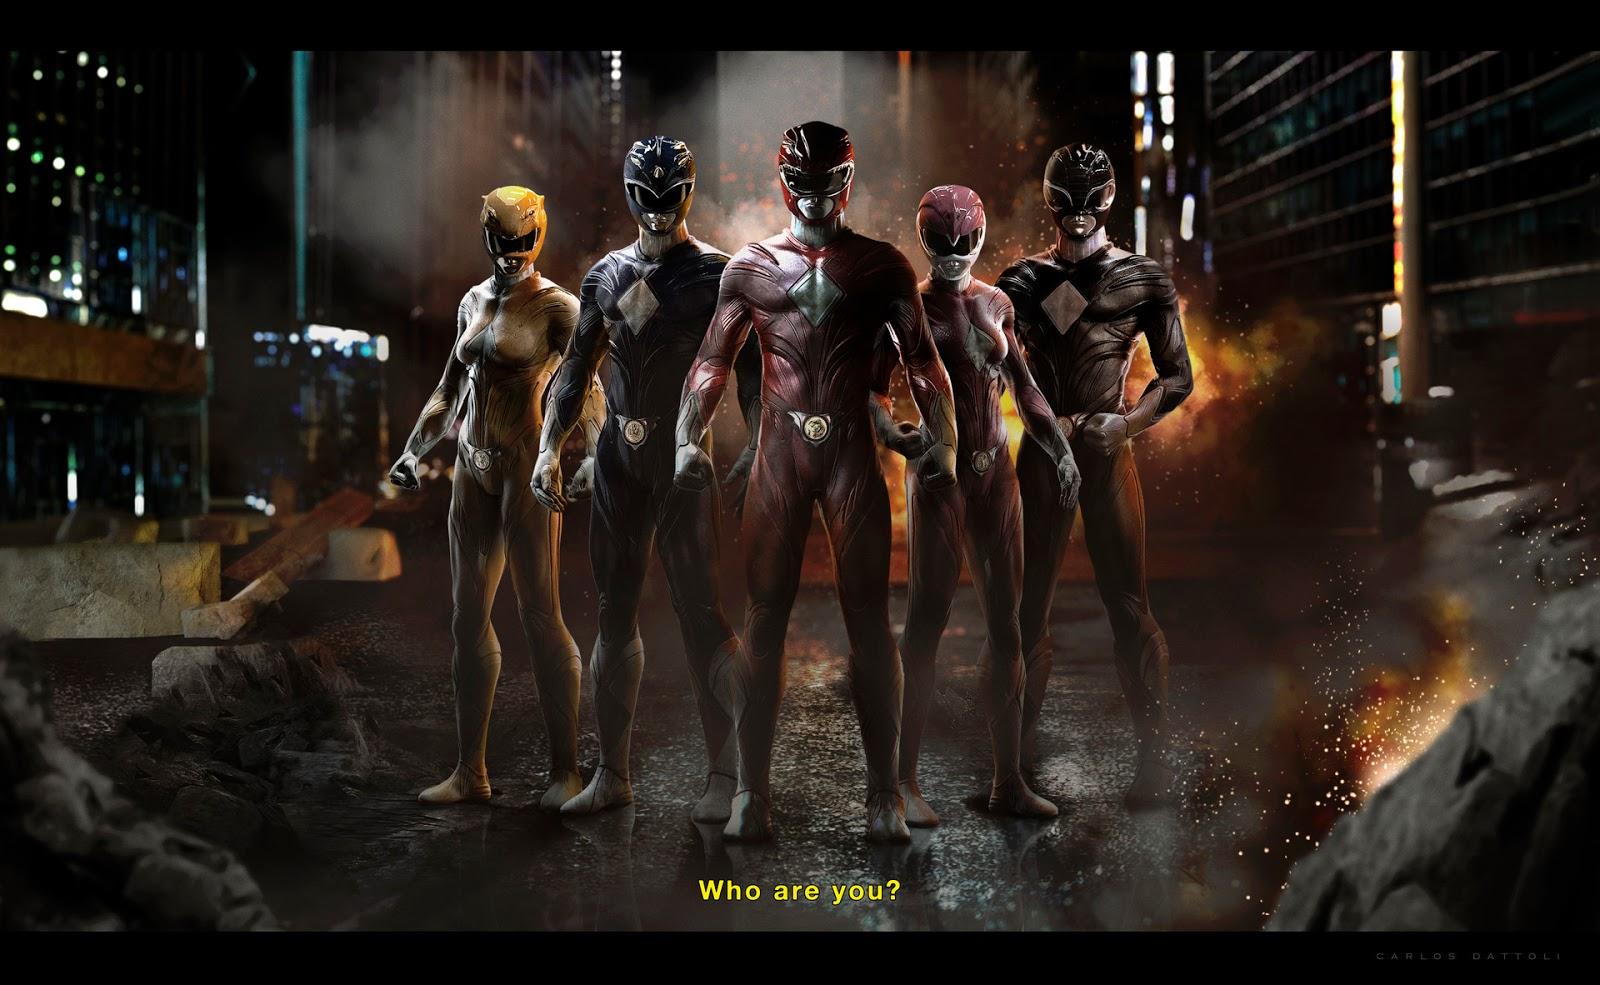 Carlos Dattoli Power Rangers